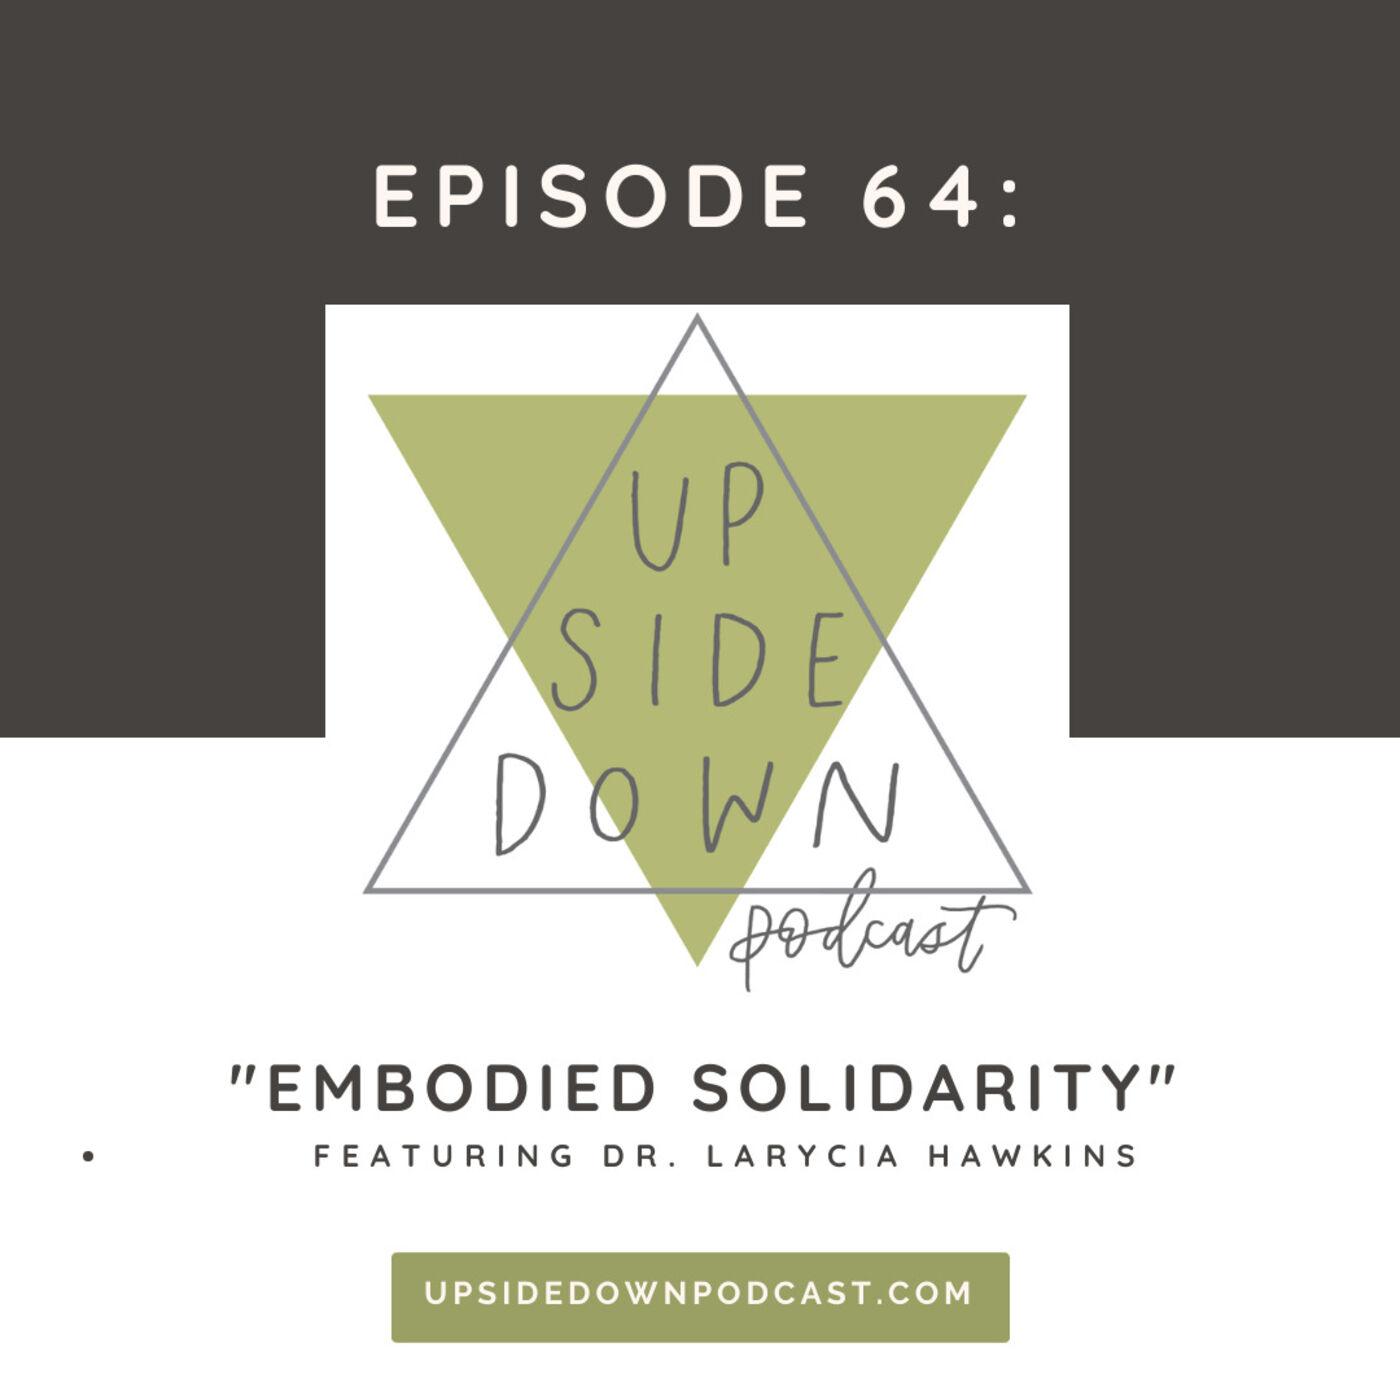 Episode 64 - Embodied Solidarity